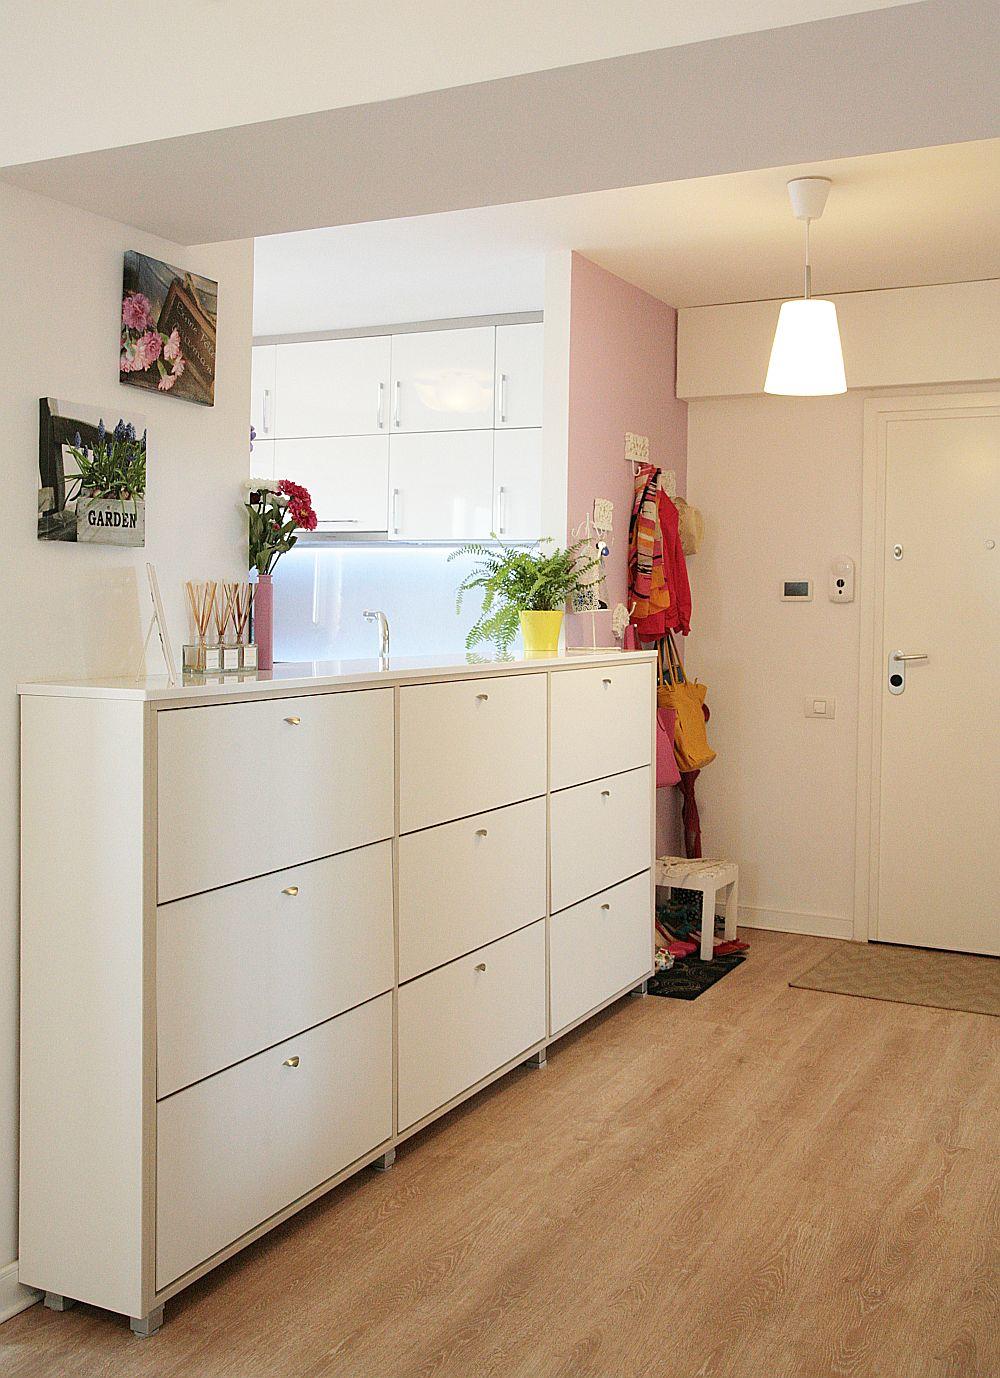 adelaparvu.com despre amenajare apartament Bucuresti, design interior Alia Bakutayan si Daniel Tufis - Valdecor (31)